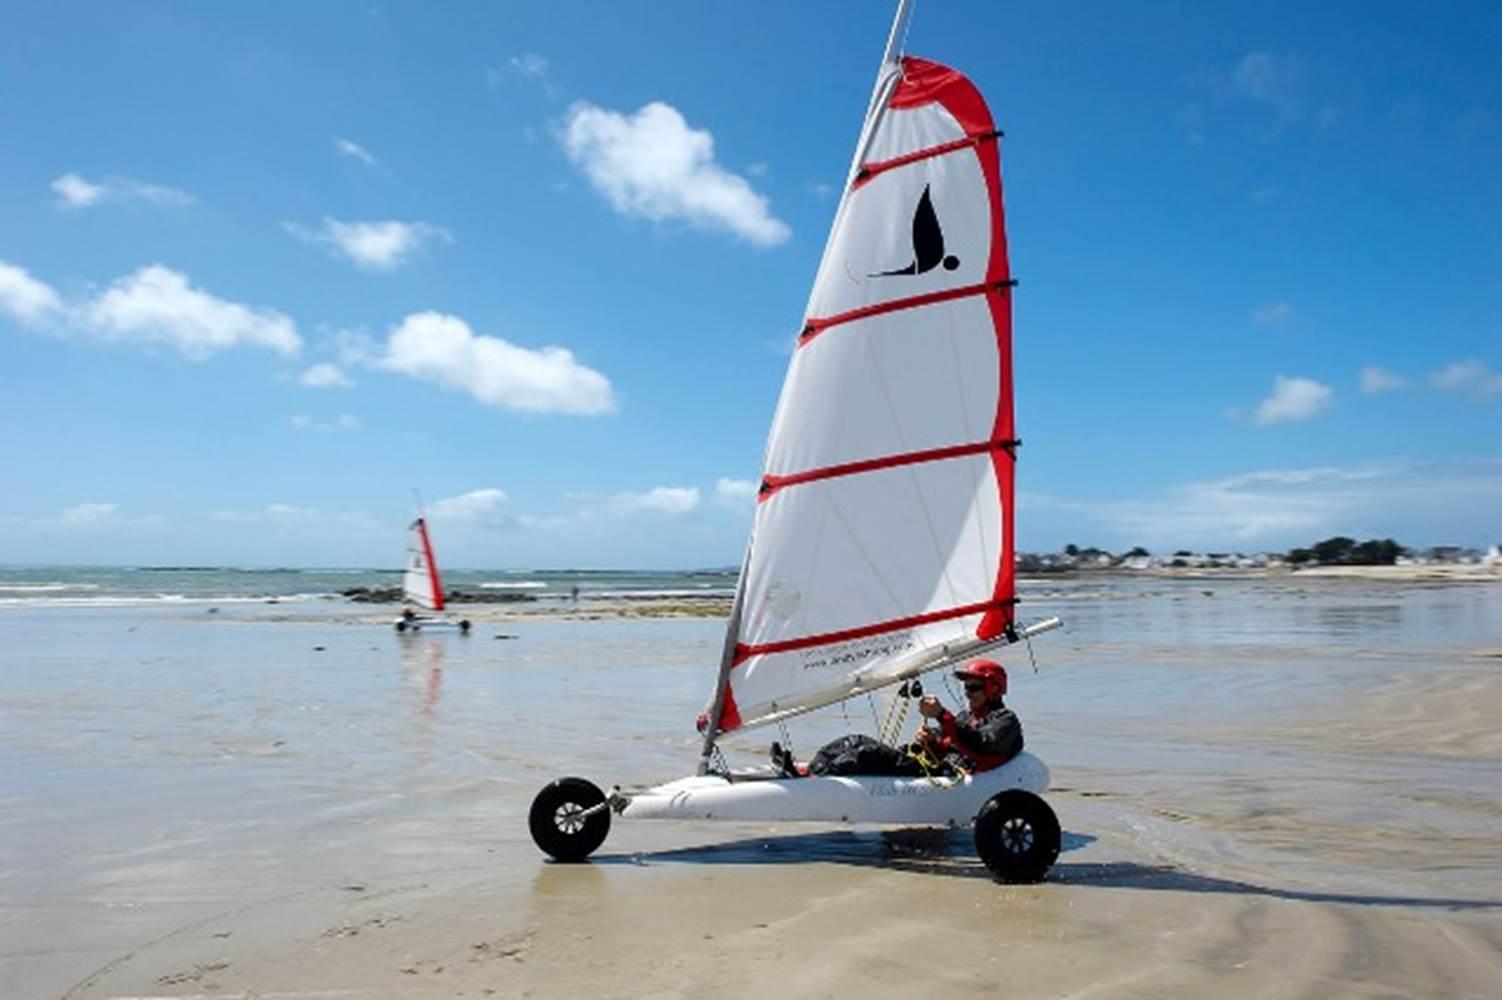 centre-nautique-Larmor-Plage-Groix-Lorient-Morbihan-Bretagne-Sud © y zedda